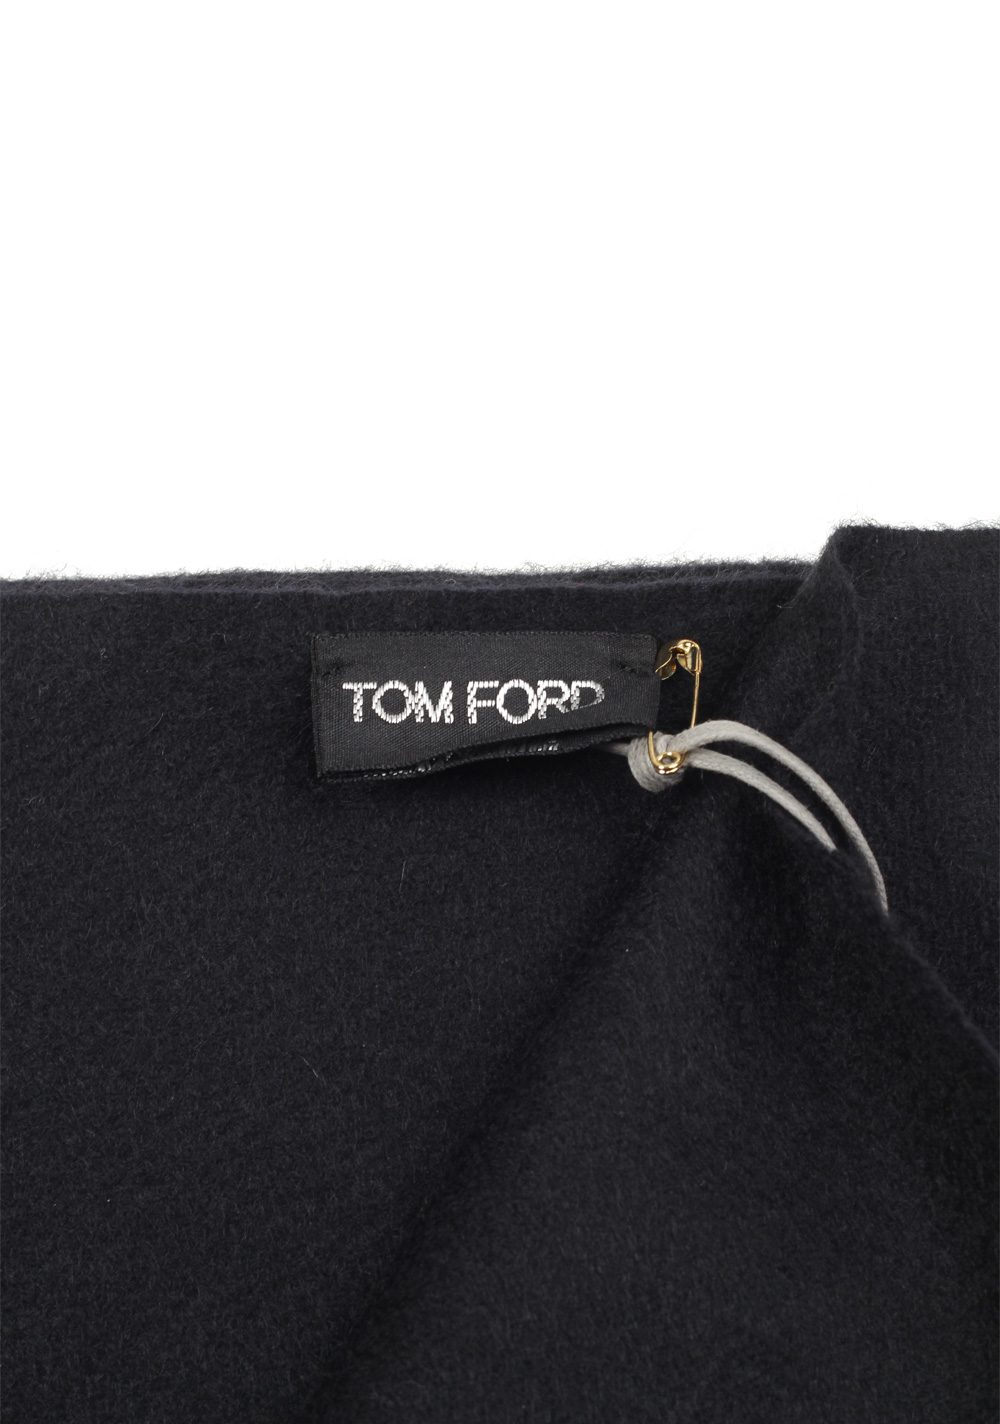 Tom Ford Black Cashmere Signature Scarf 60″ / 14″ | Costume Limité